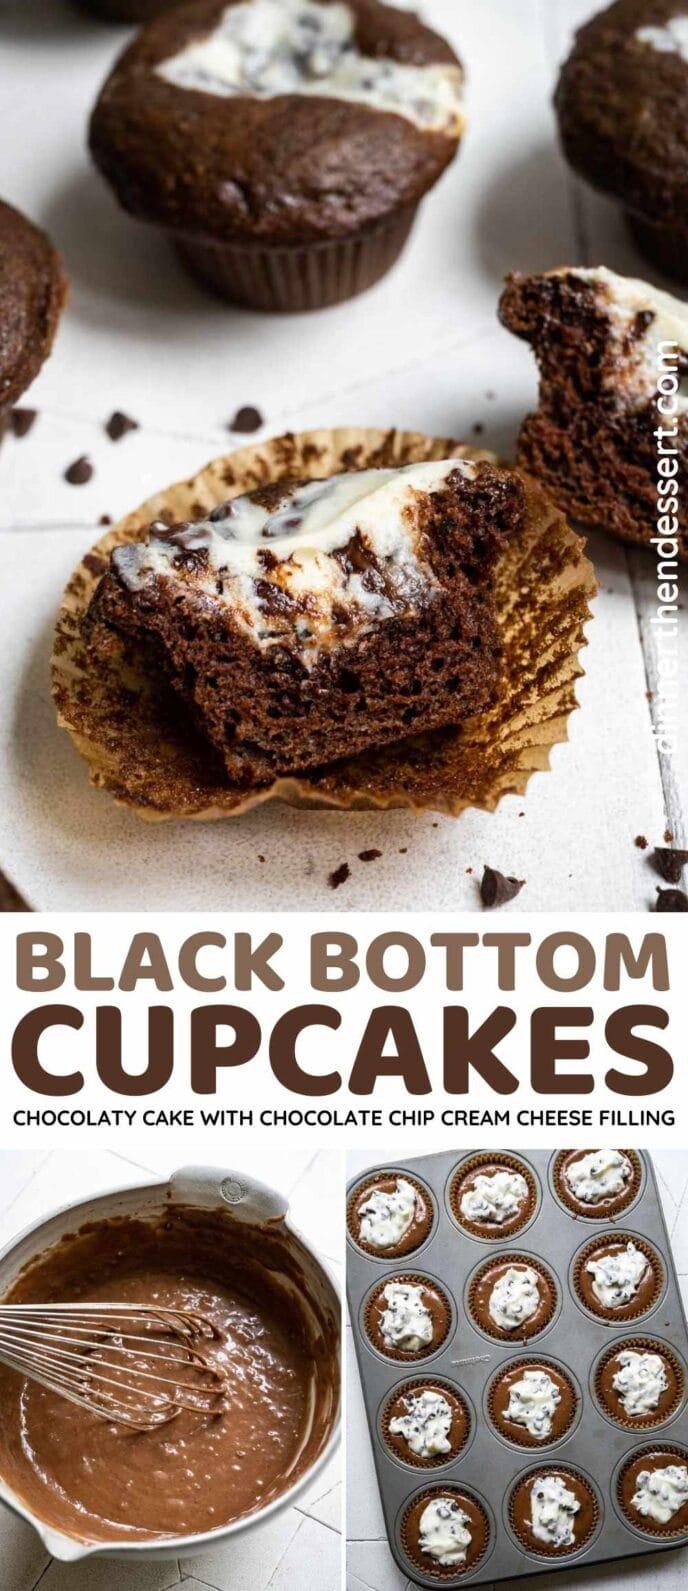 Black Bottom Cupcakes Collage